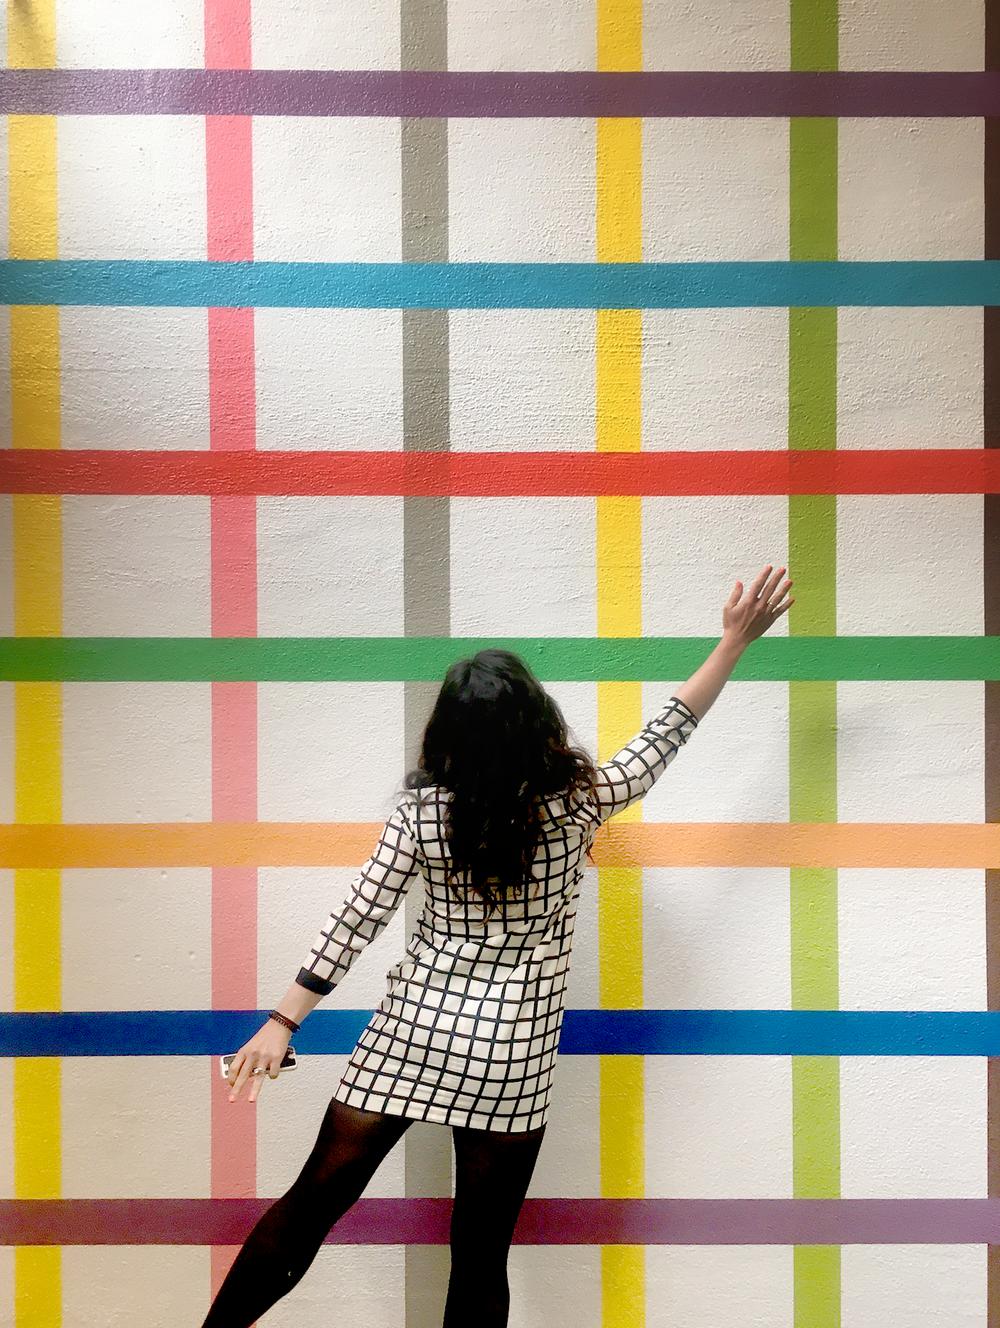 colorfactor